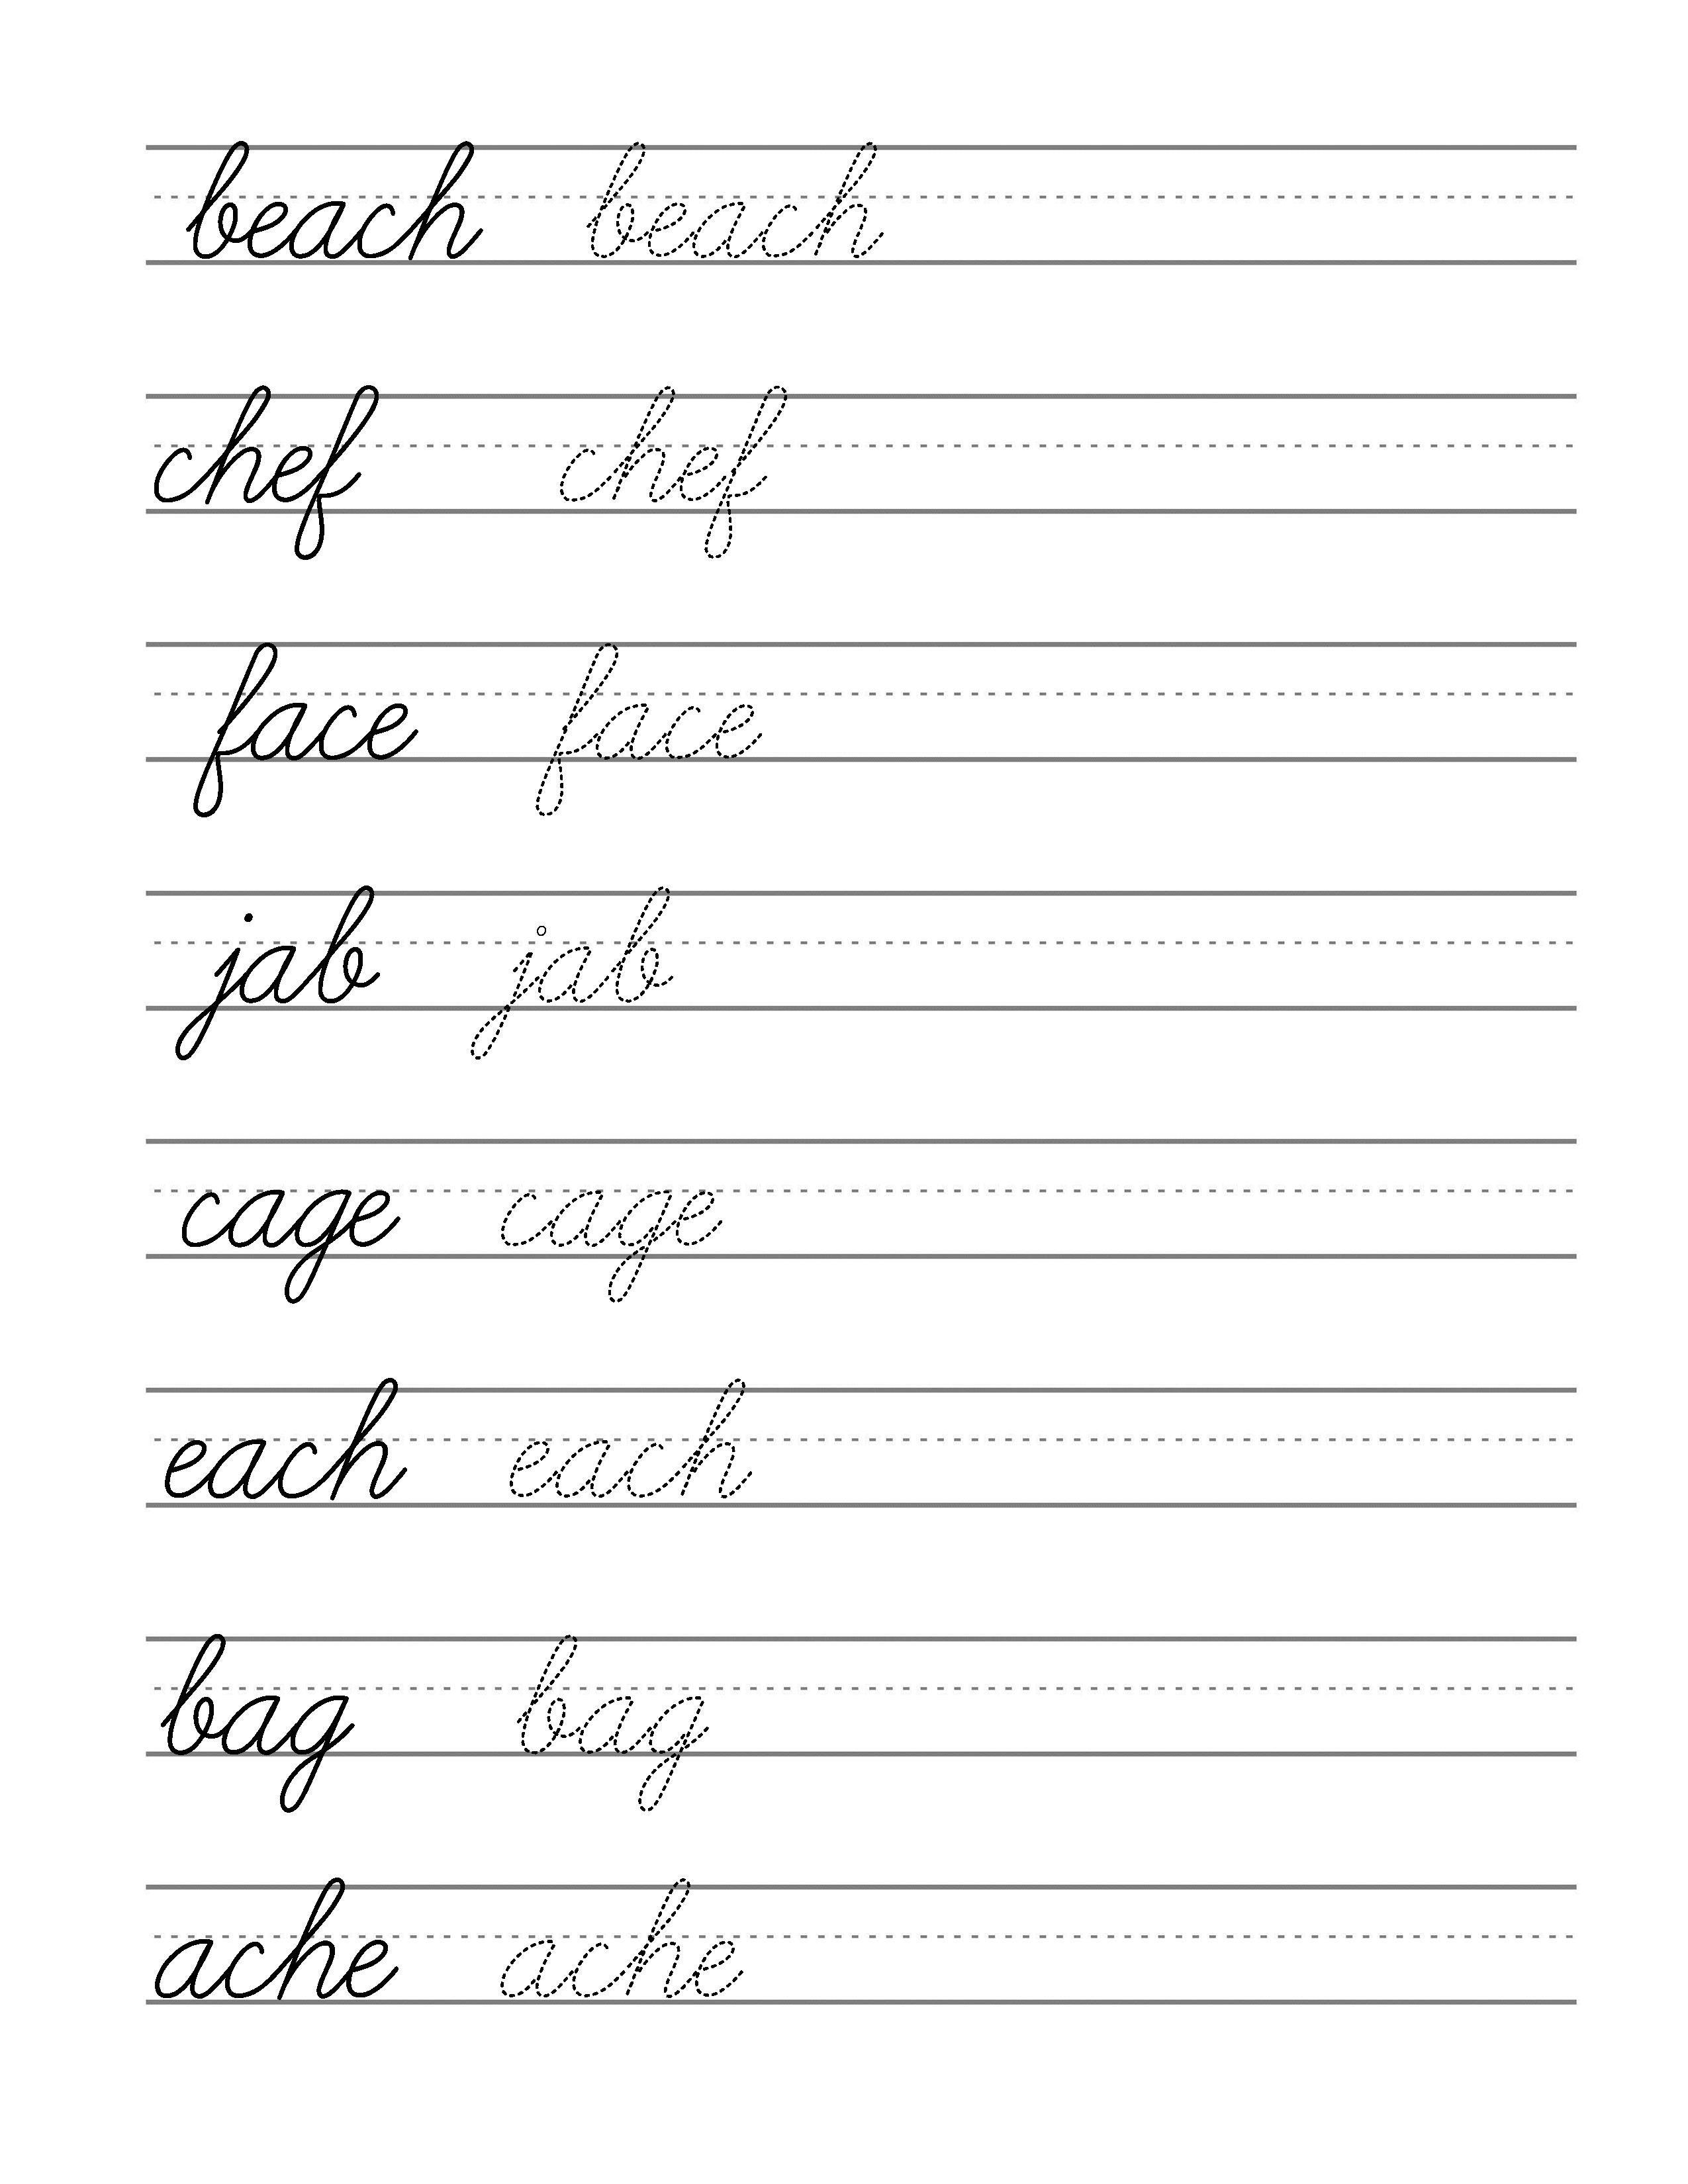 Cursive worksheet generator - Dashed with lines. Handwriting ...